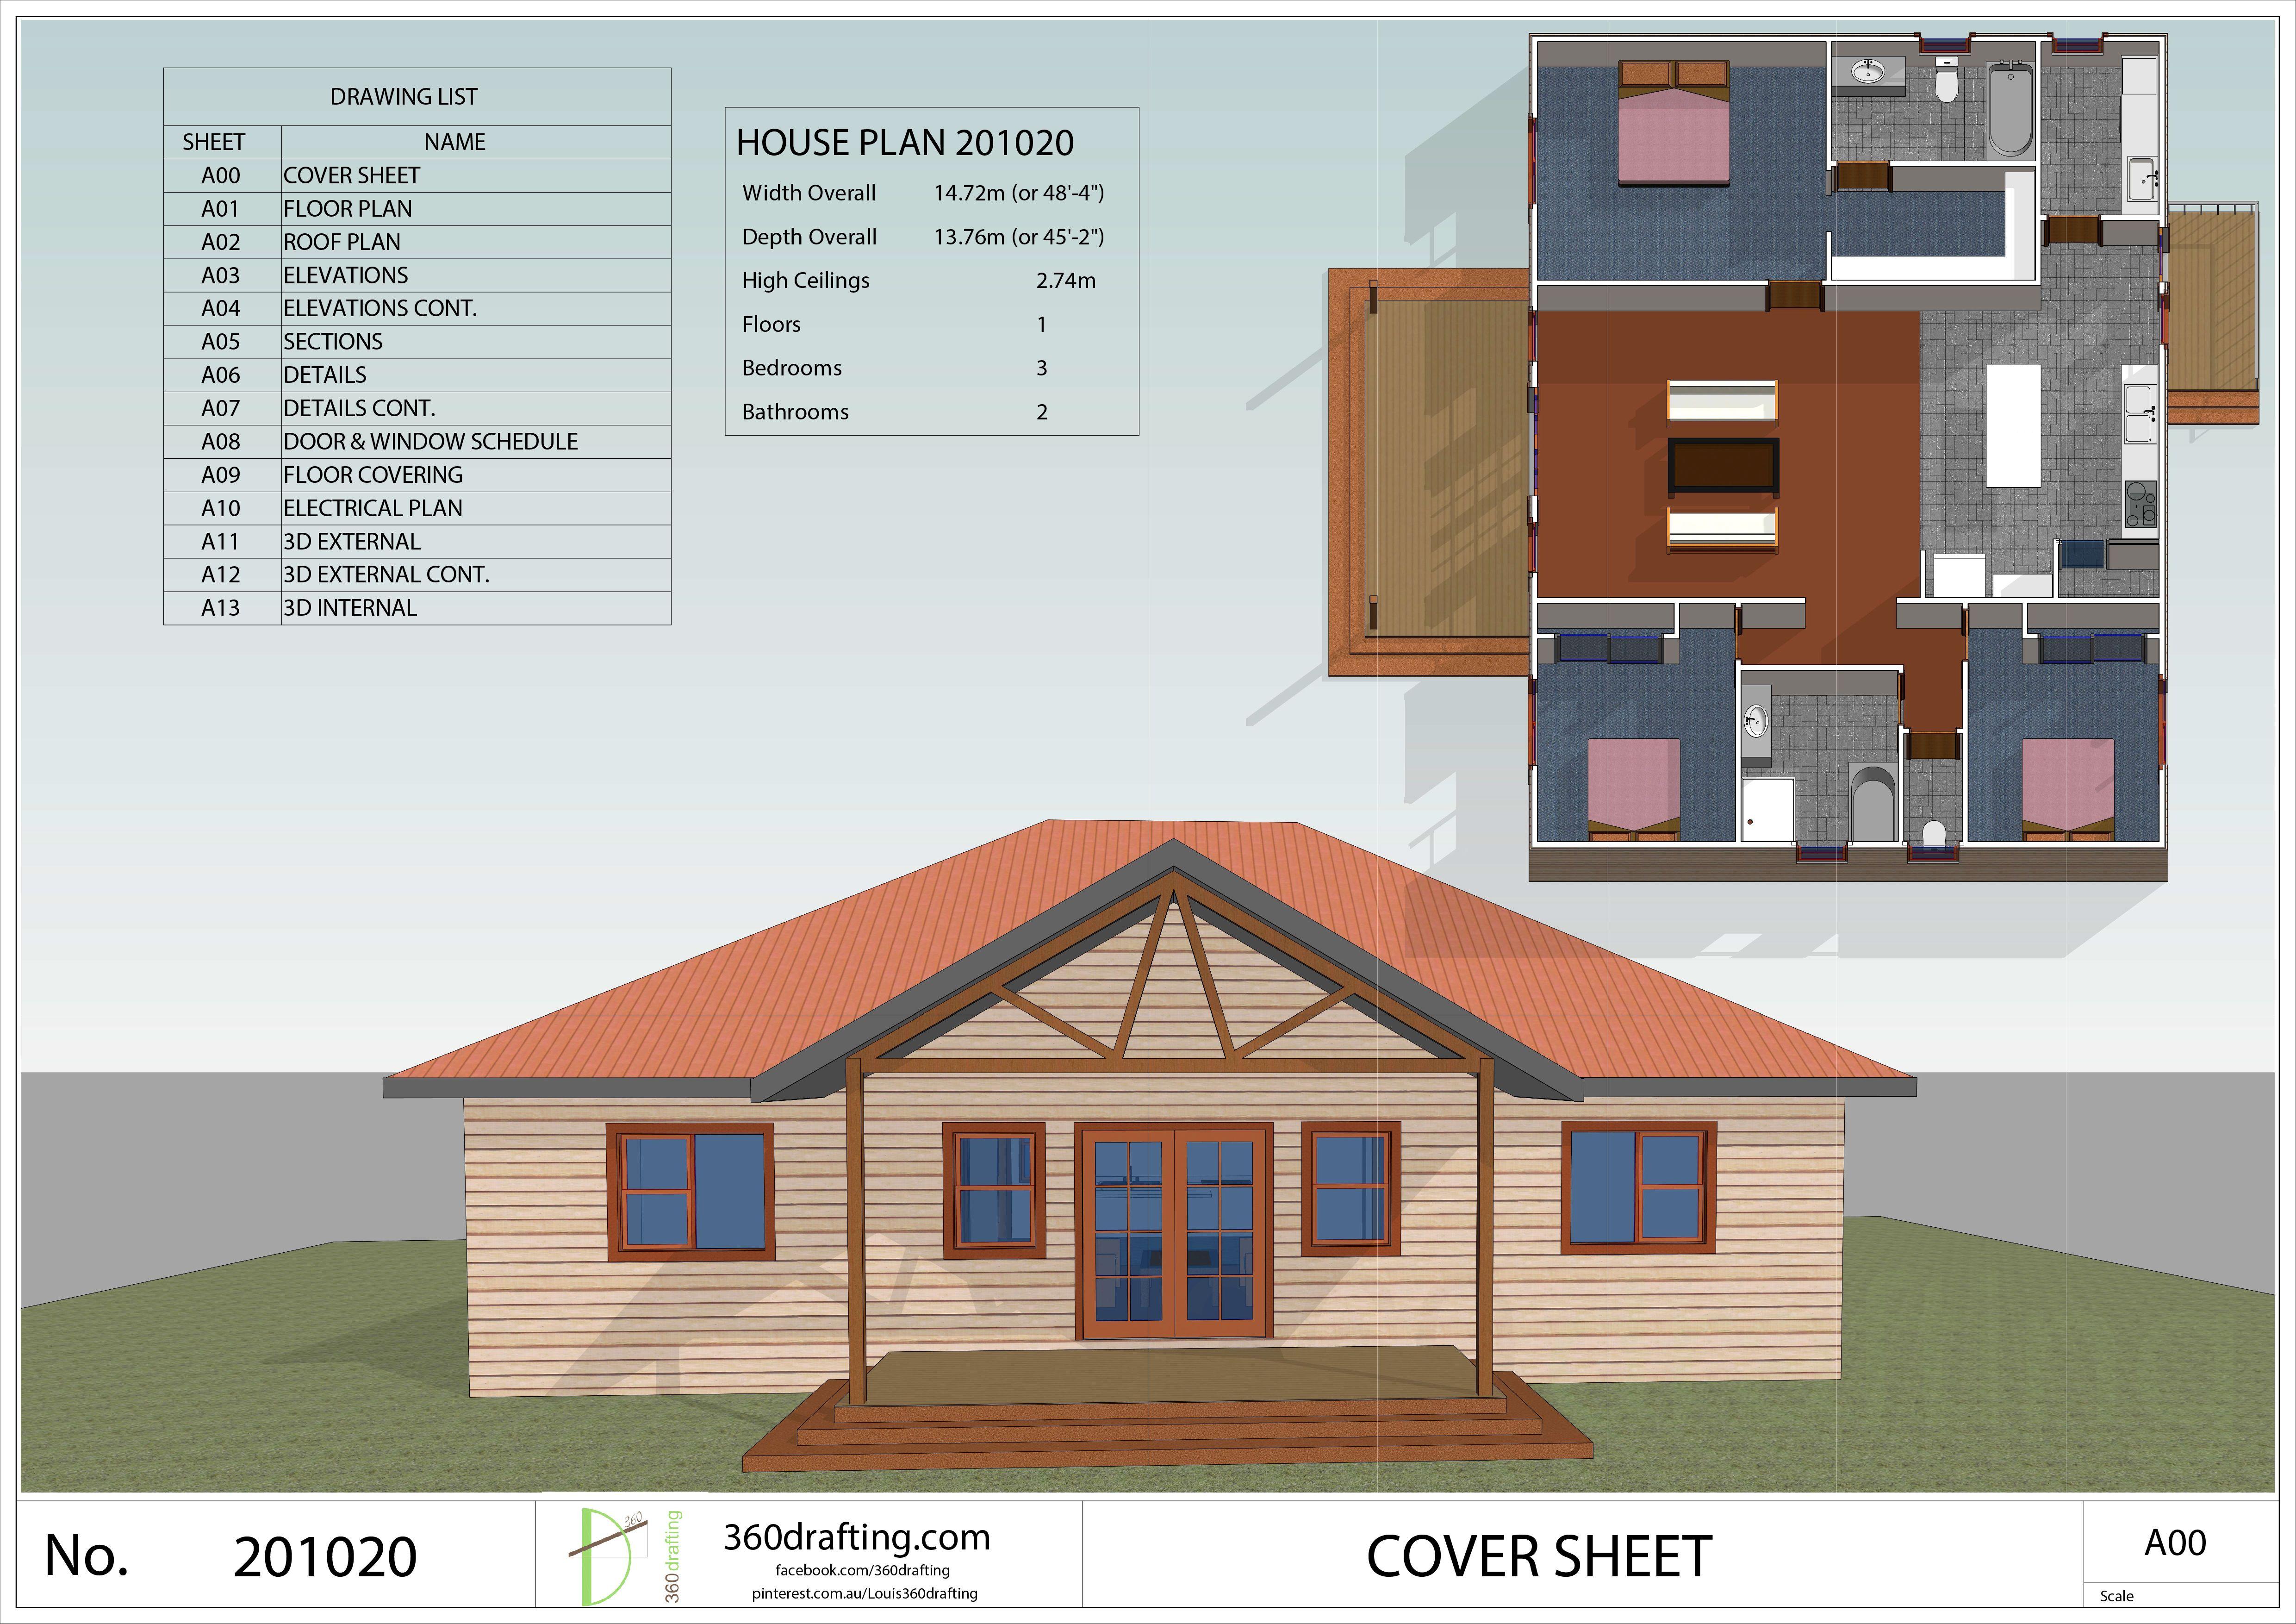 HOUSE PLAN single story house 3 bedrooms 2 bathrooms pdf floor plan instant